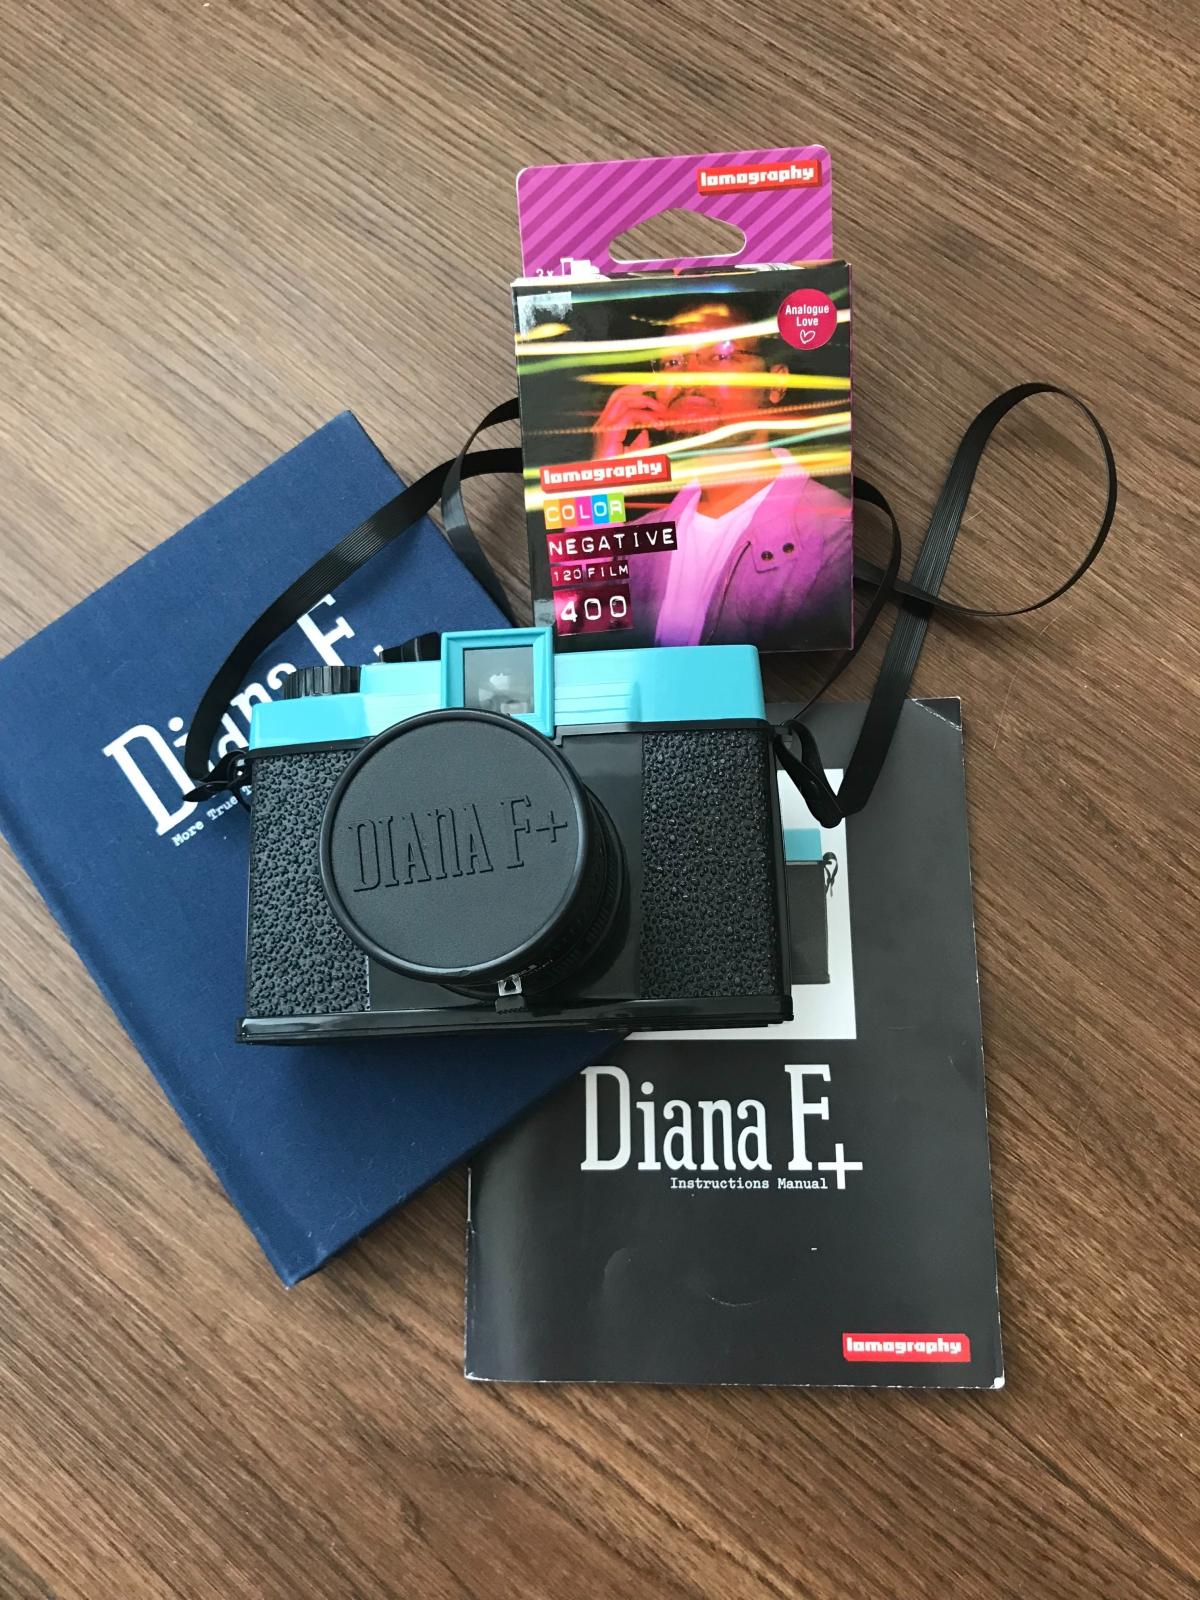 Diana F+ Camera